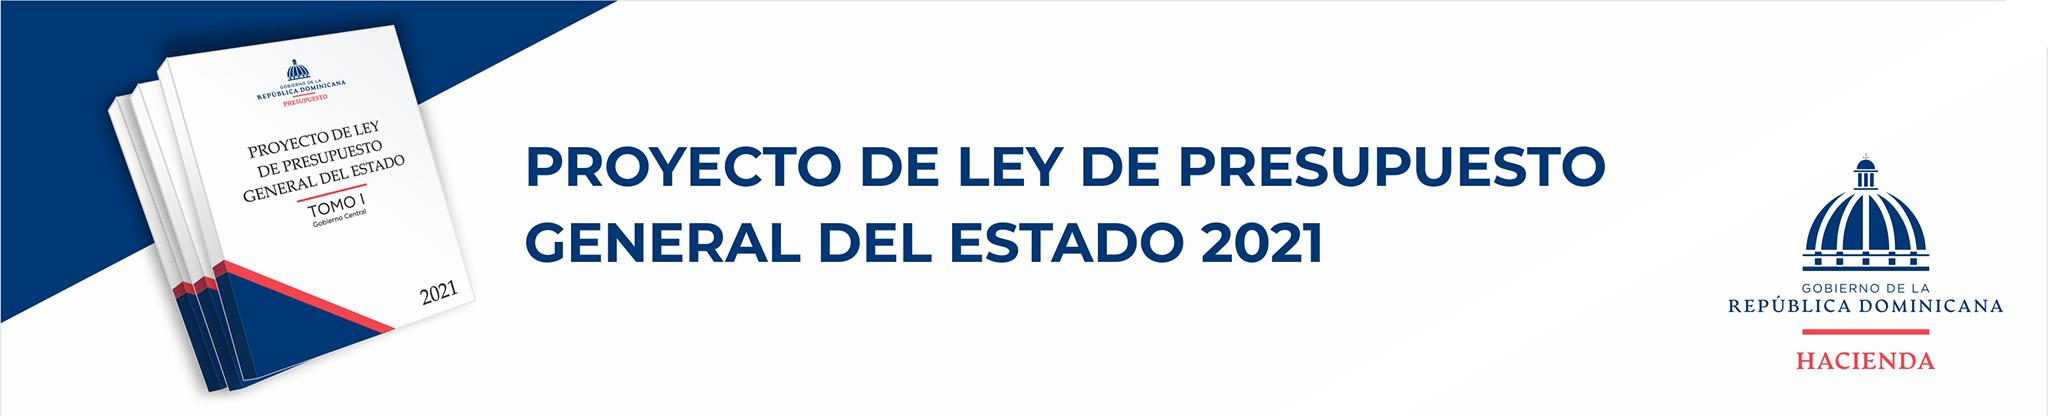 banner presupuesto 2020